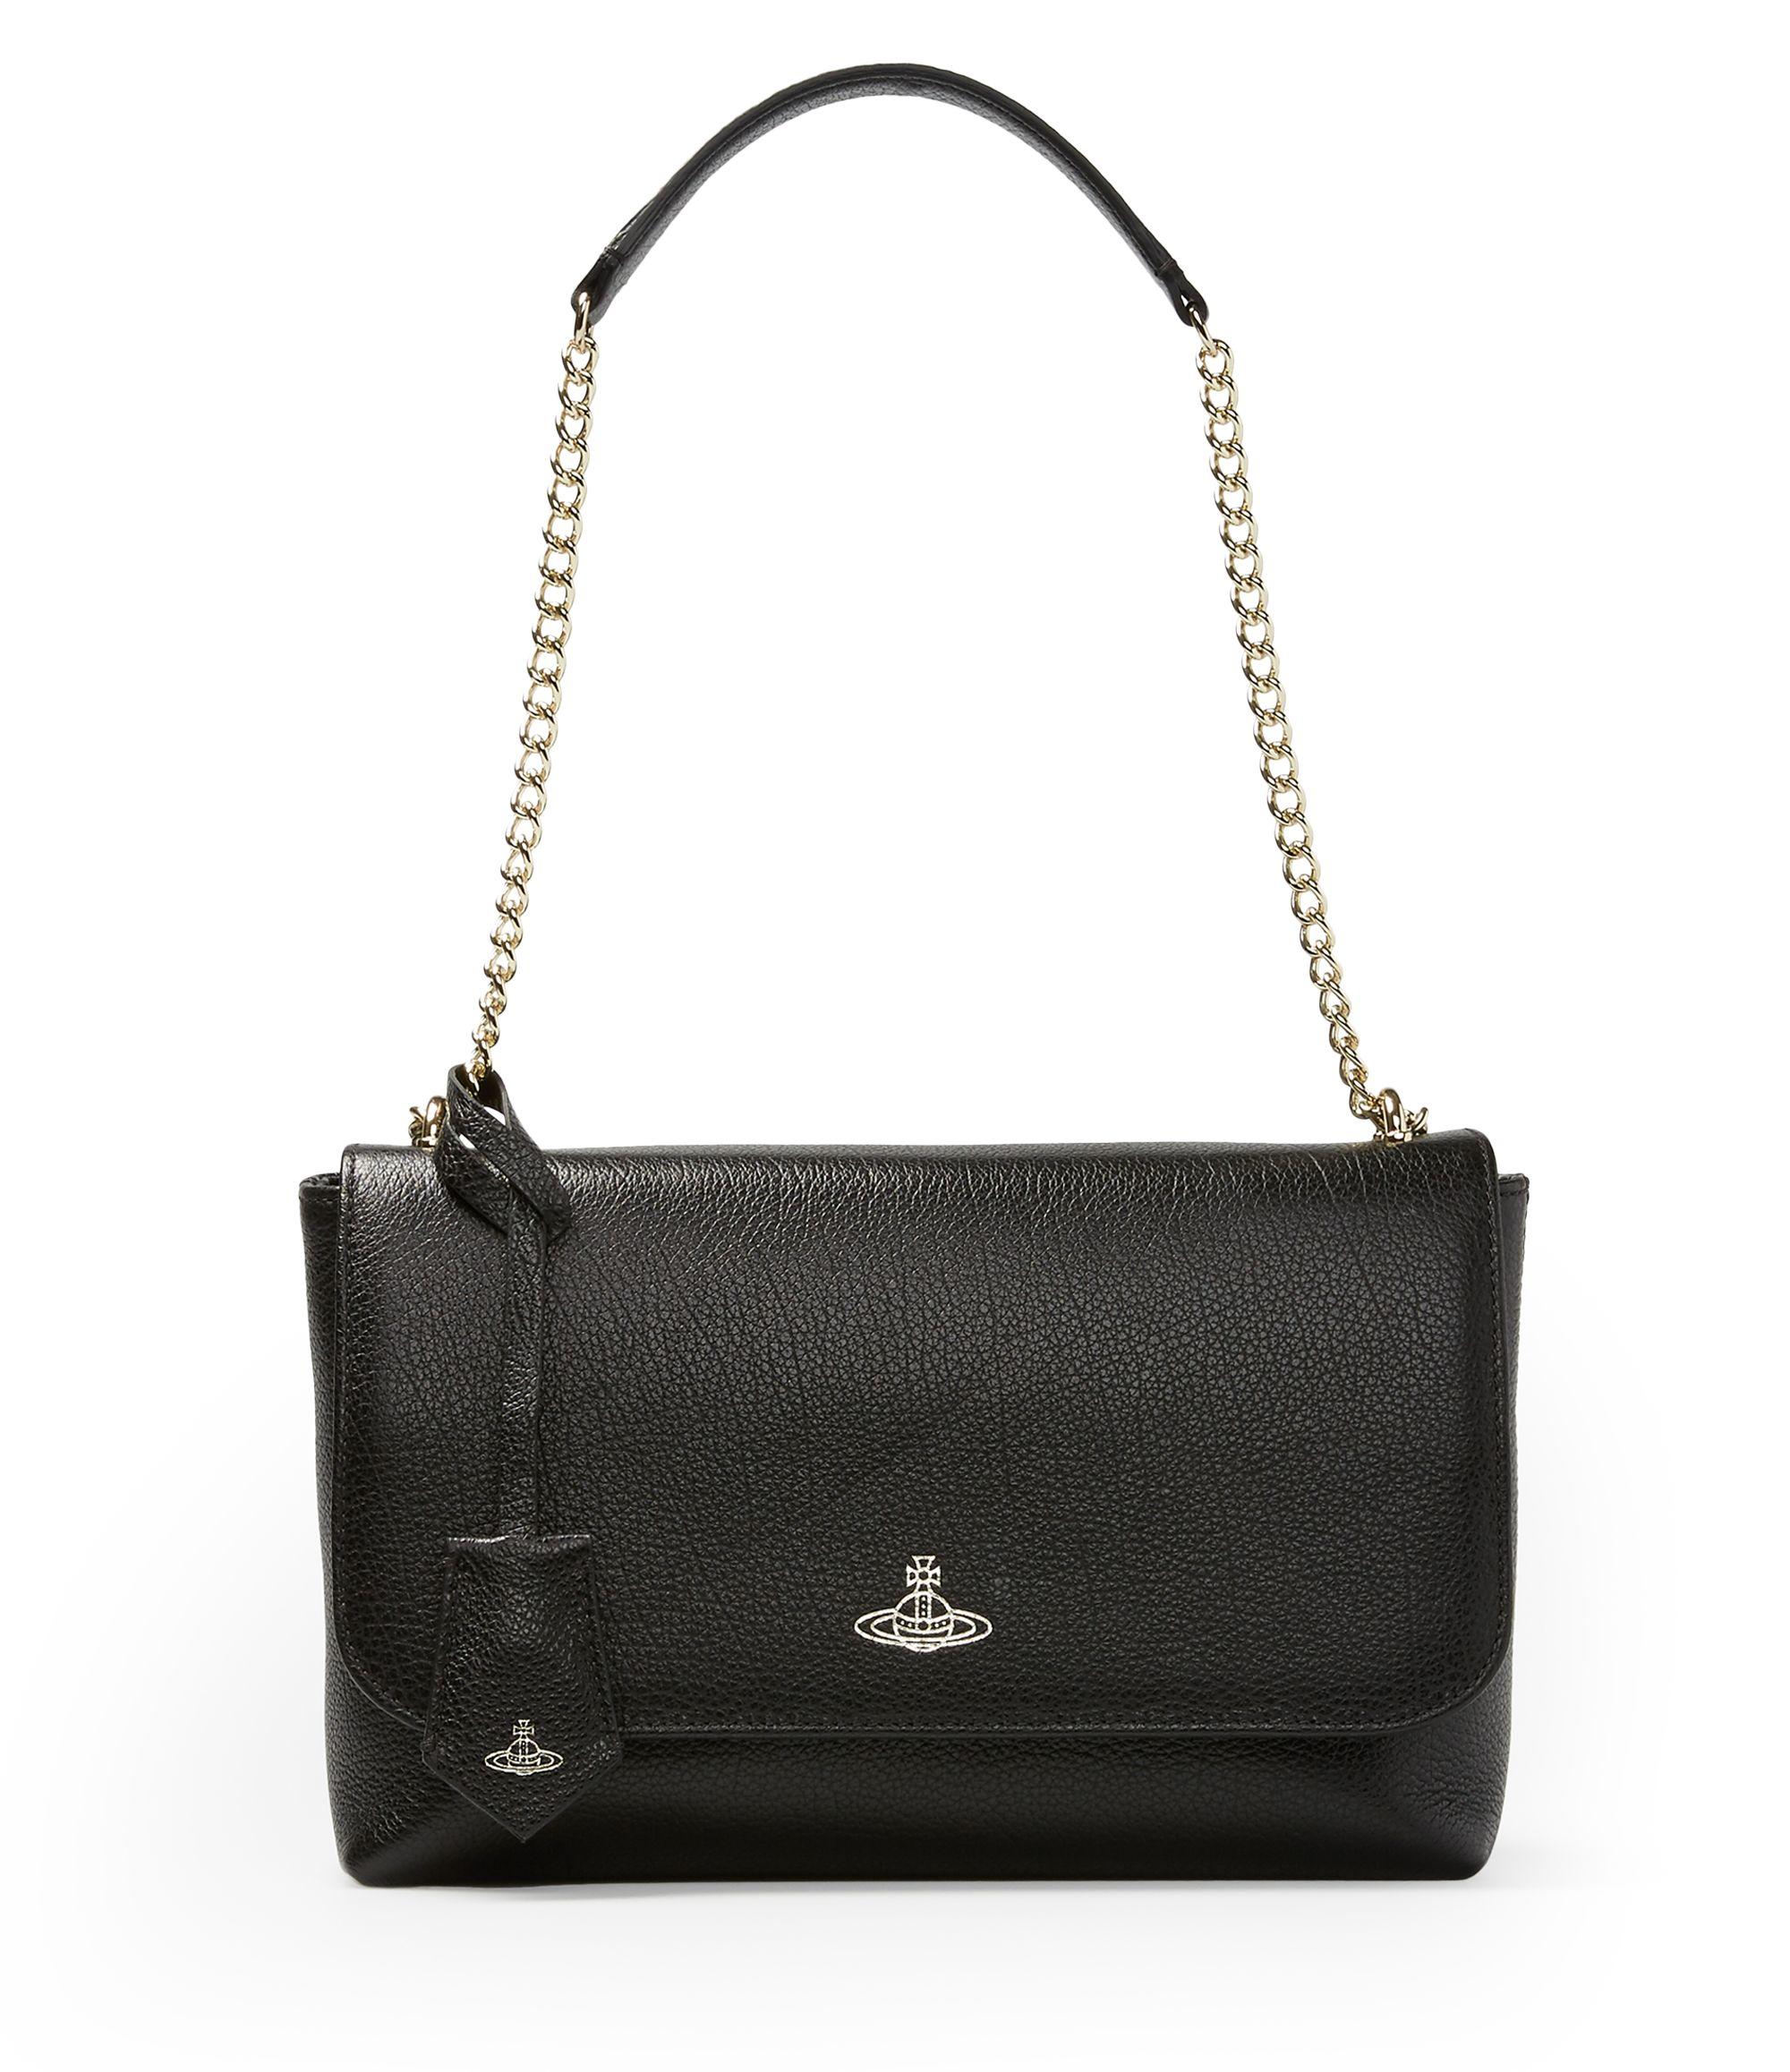 Top Handle Handbag, Anglomania, Black, Patent, 2017, one size Vivienne Westwood